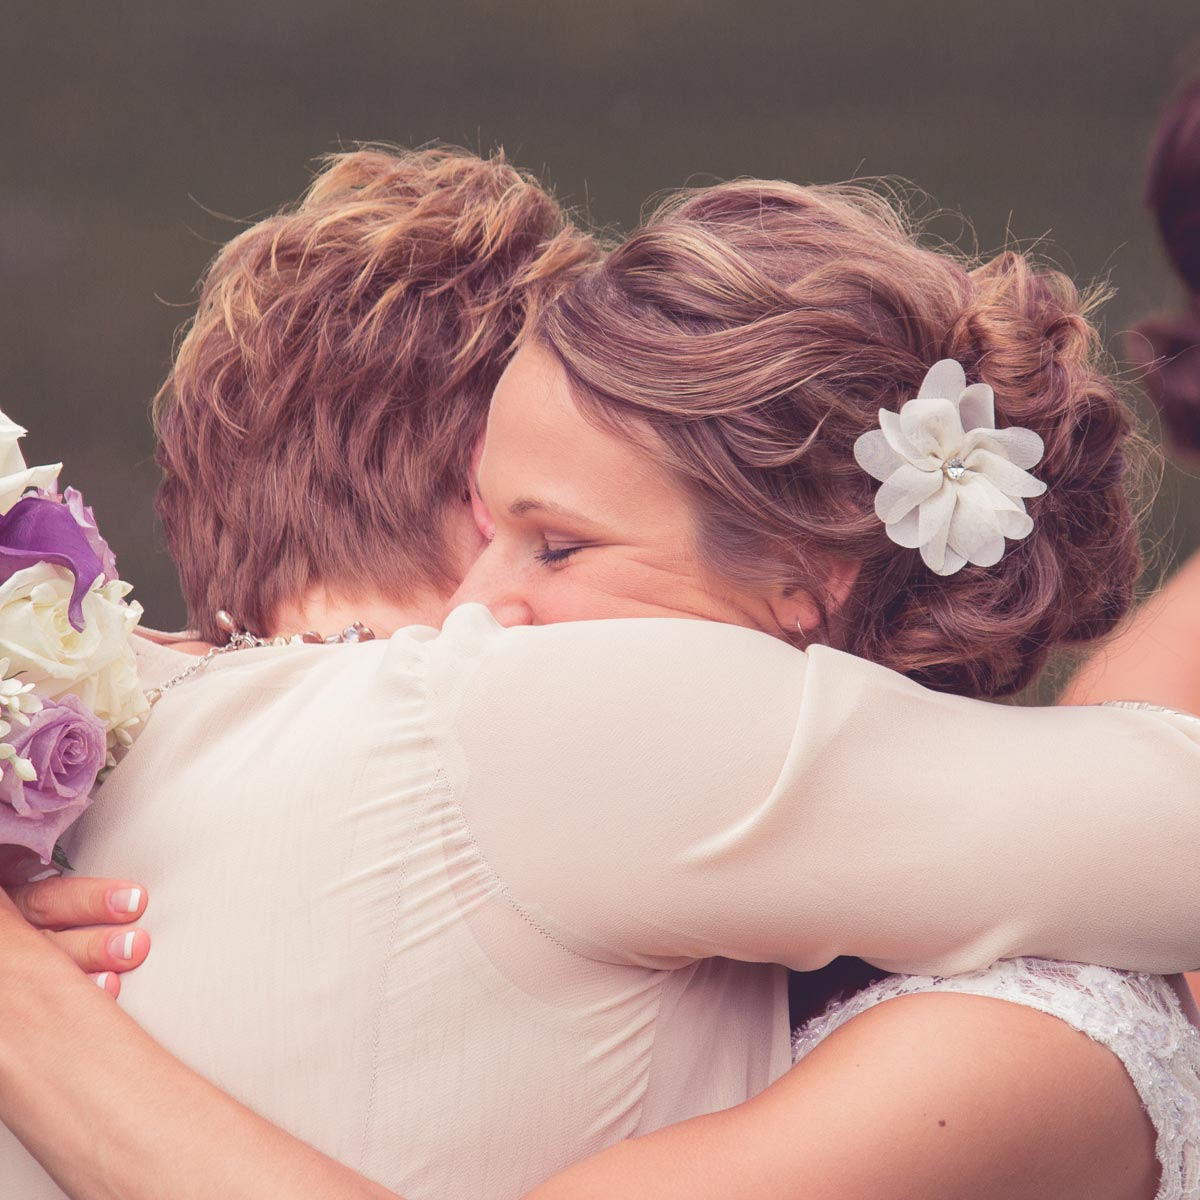 evansville-wedding-photographer-pabst-photo-kokies-echo-valley-(79)